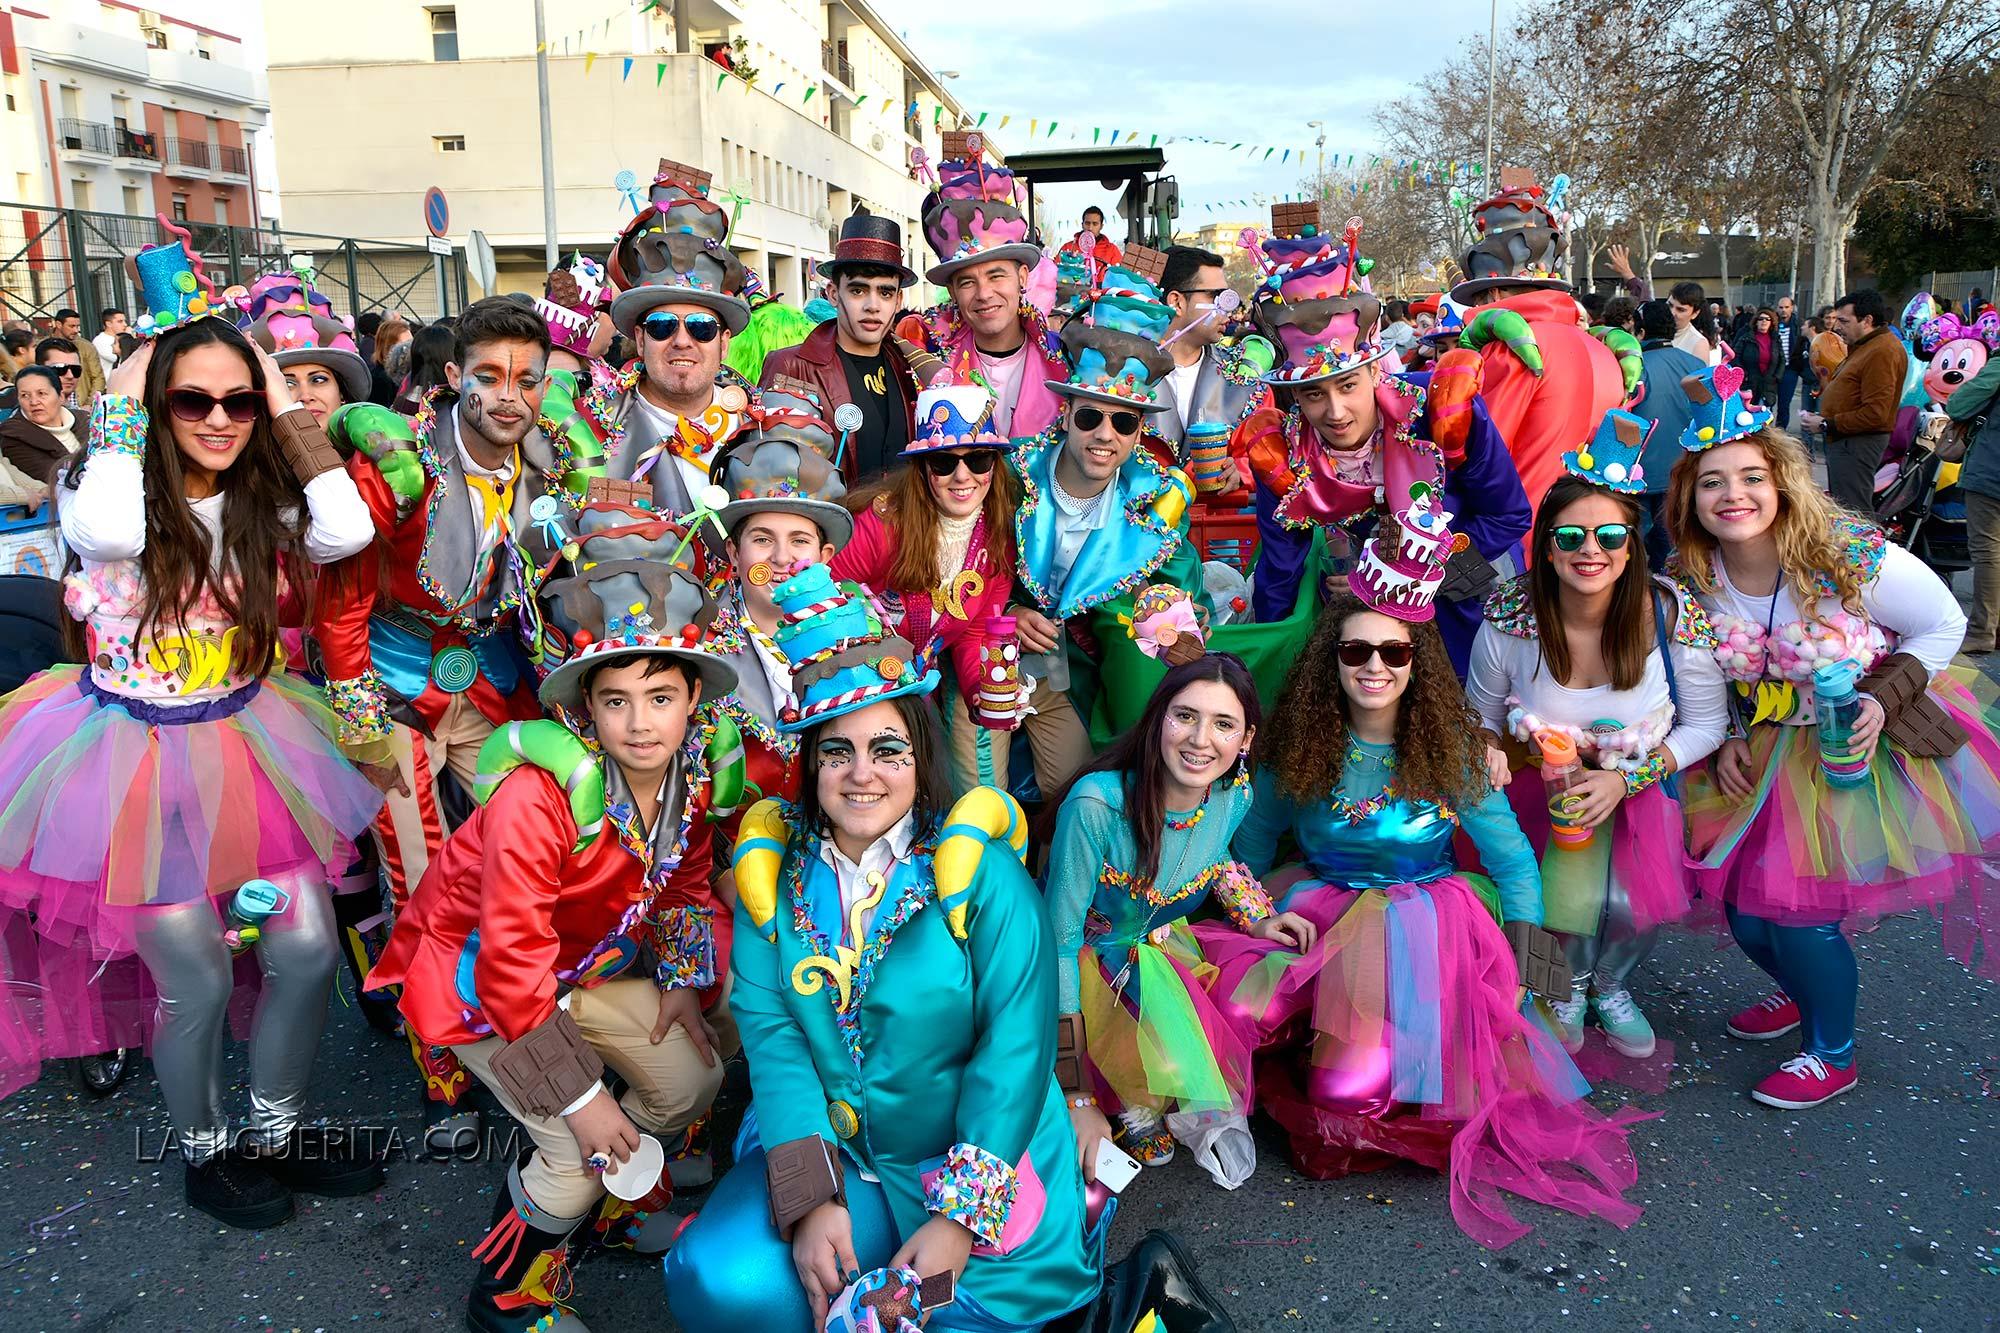 cabalgata carnaval isla cristina _DSC0901